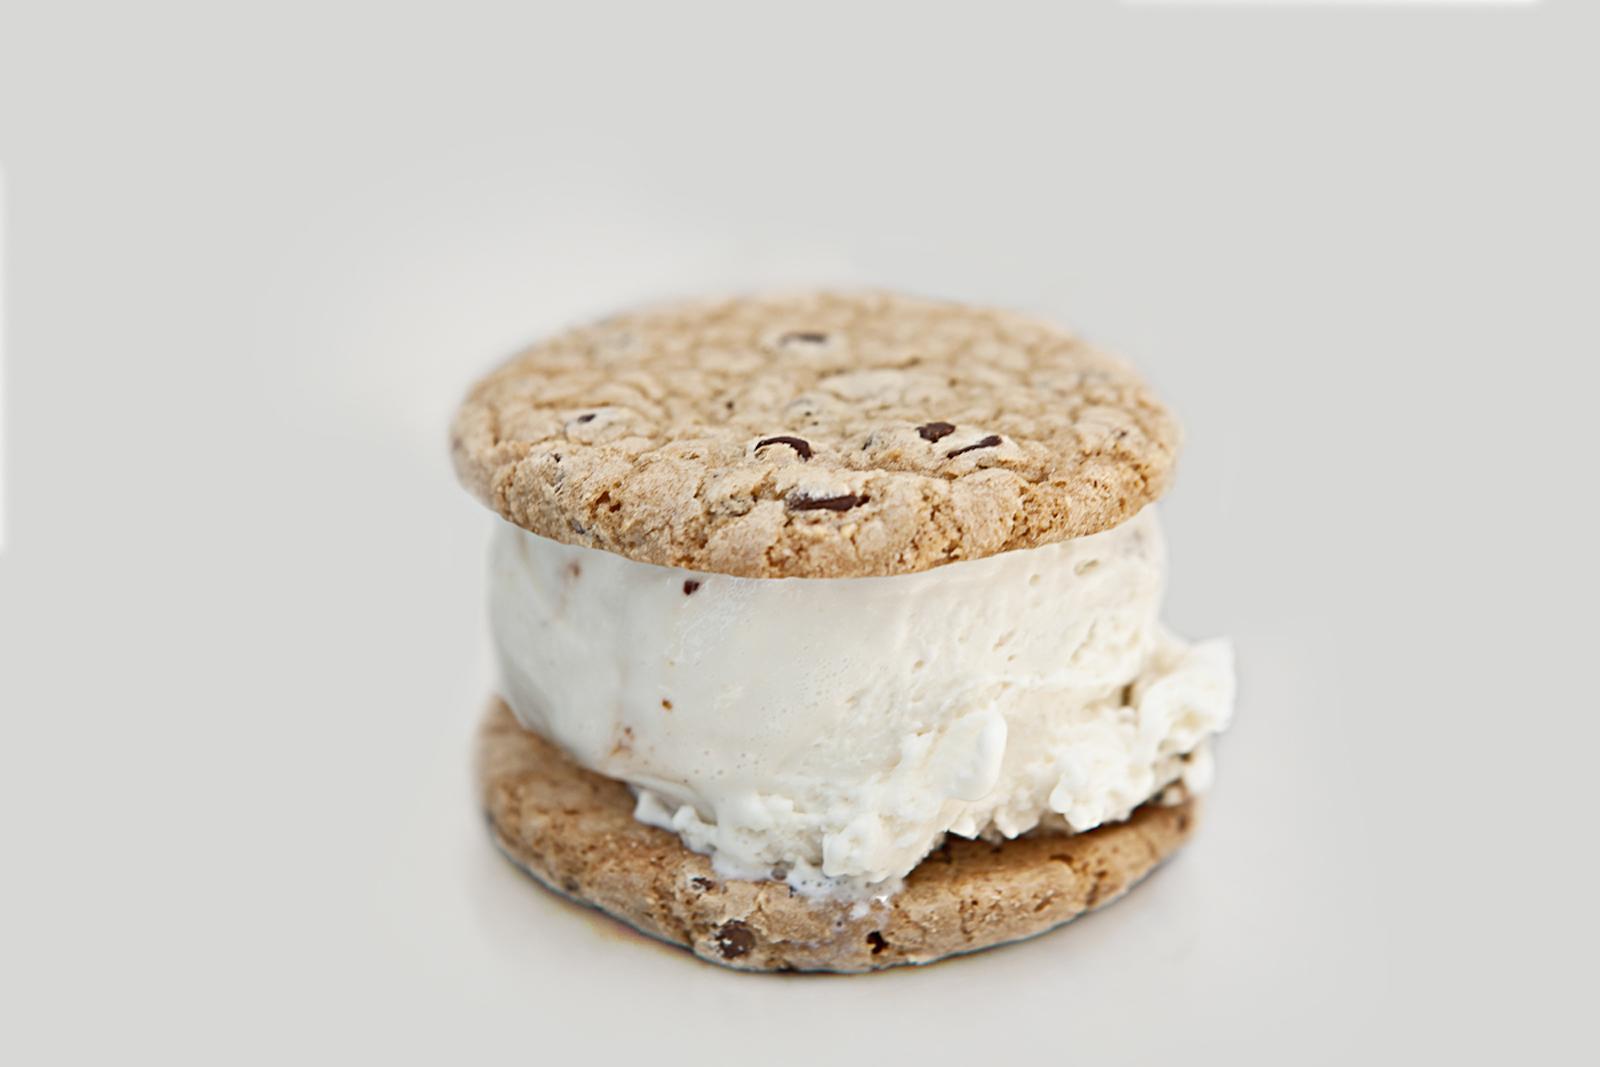 Coolhaus Ice Cream Sandwich